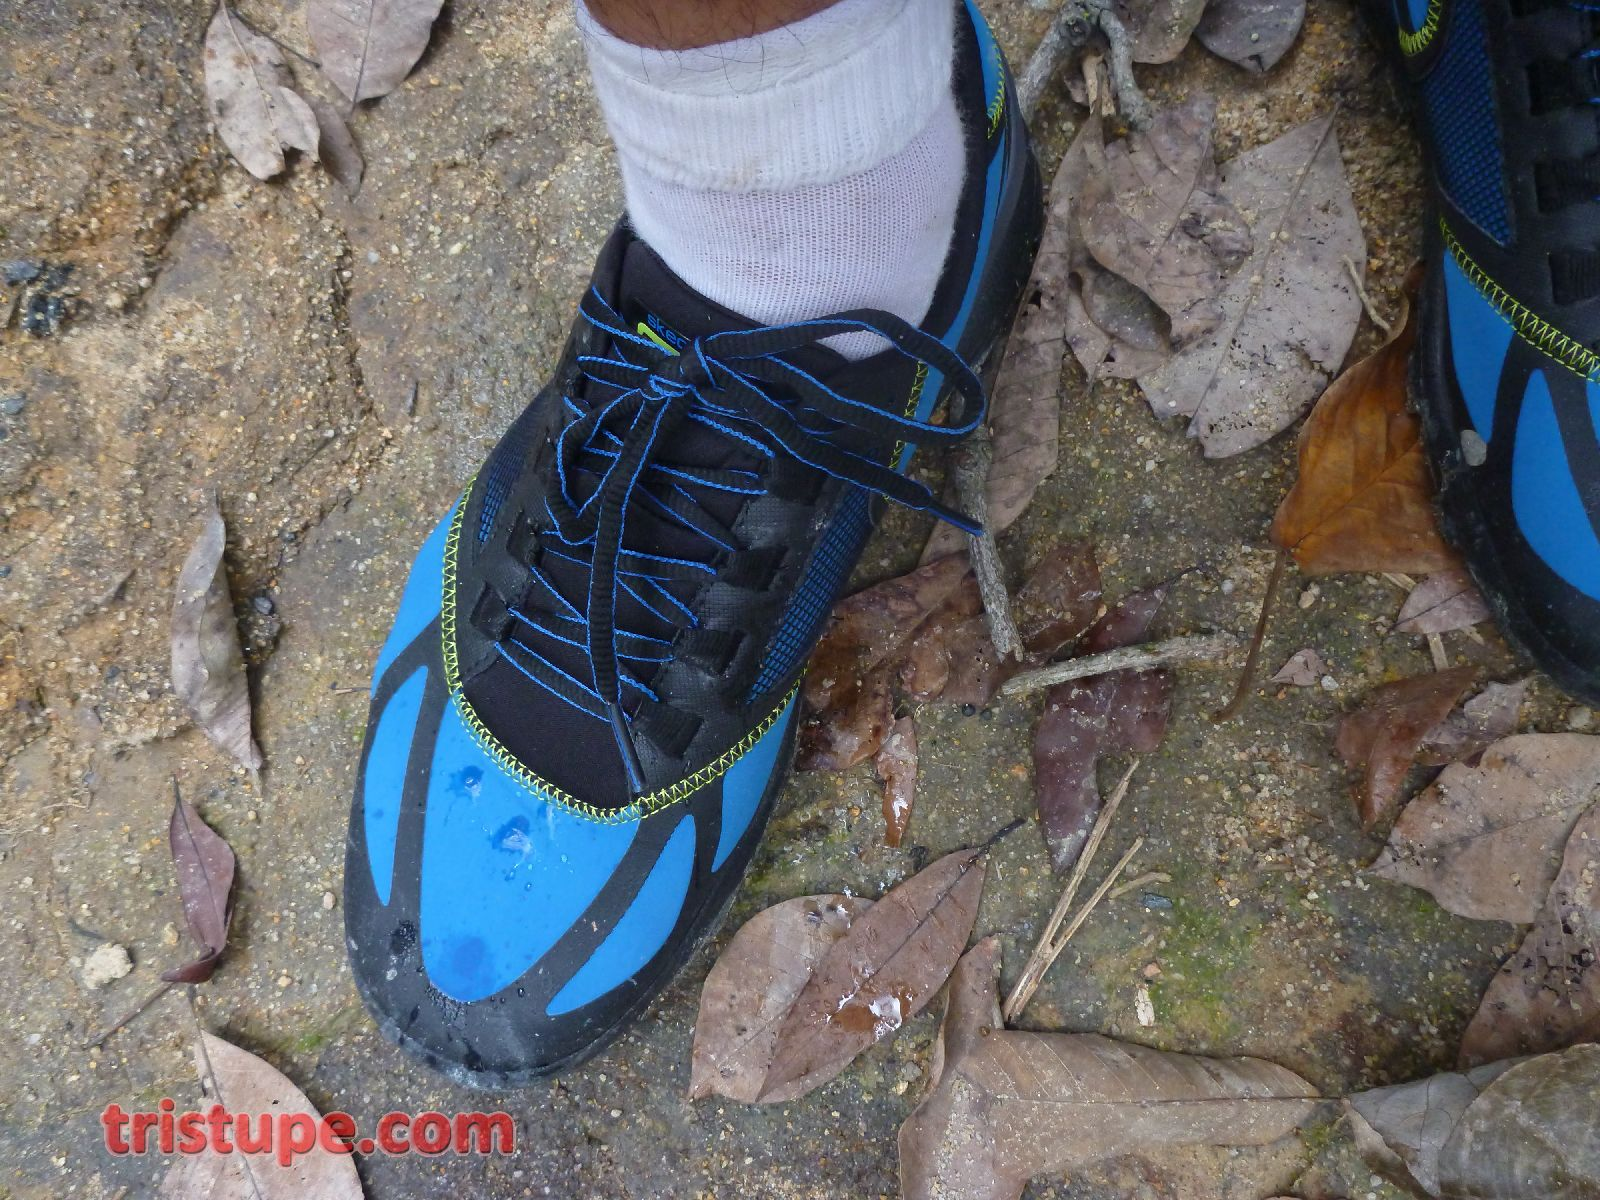 Skechers No Slip Mary Jane Shoes